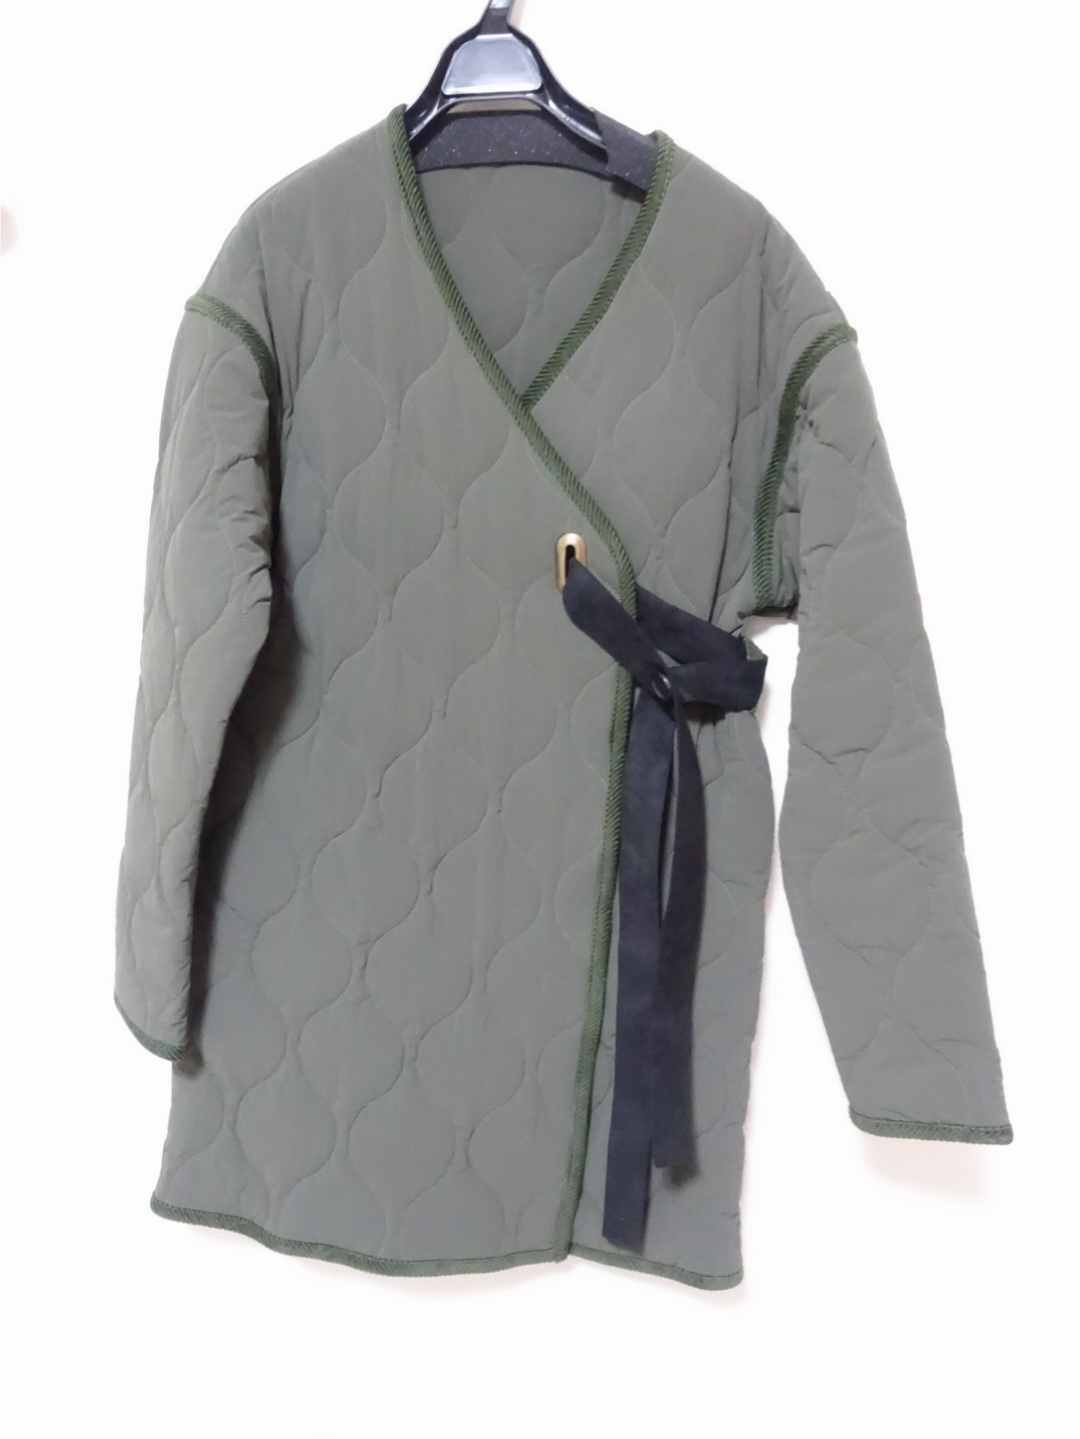 《STUDIOUS×田中亜希子さん》可愛すぎるコラボ商品が思った以上にあったかすぎる!この冬ヘビロテ決定の上着とボトム!_4